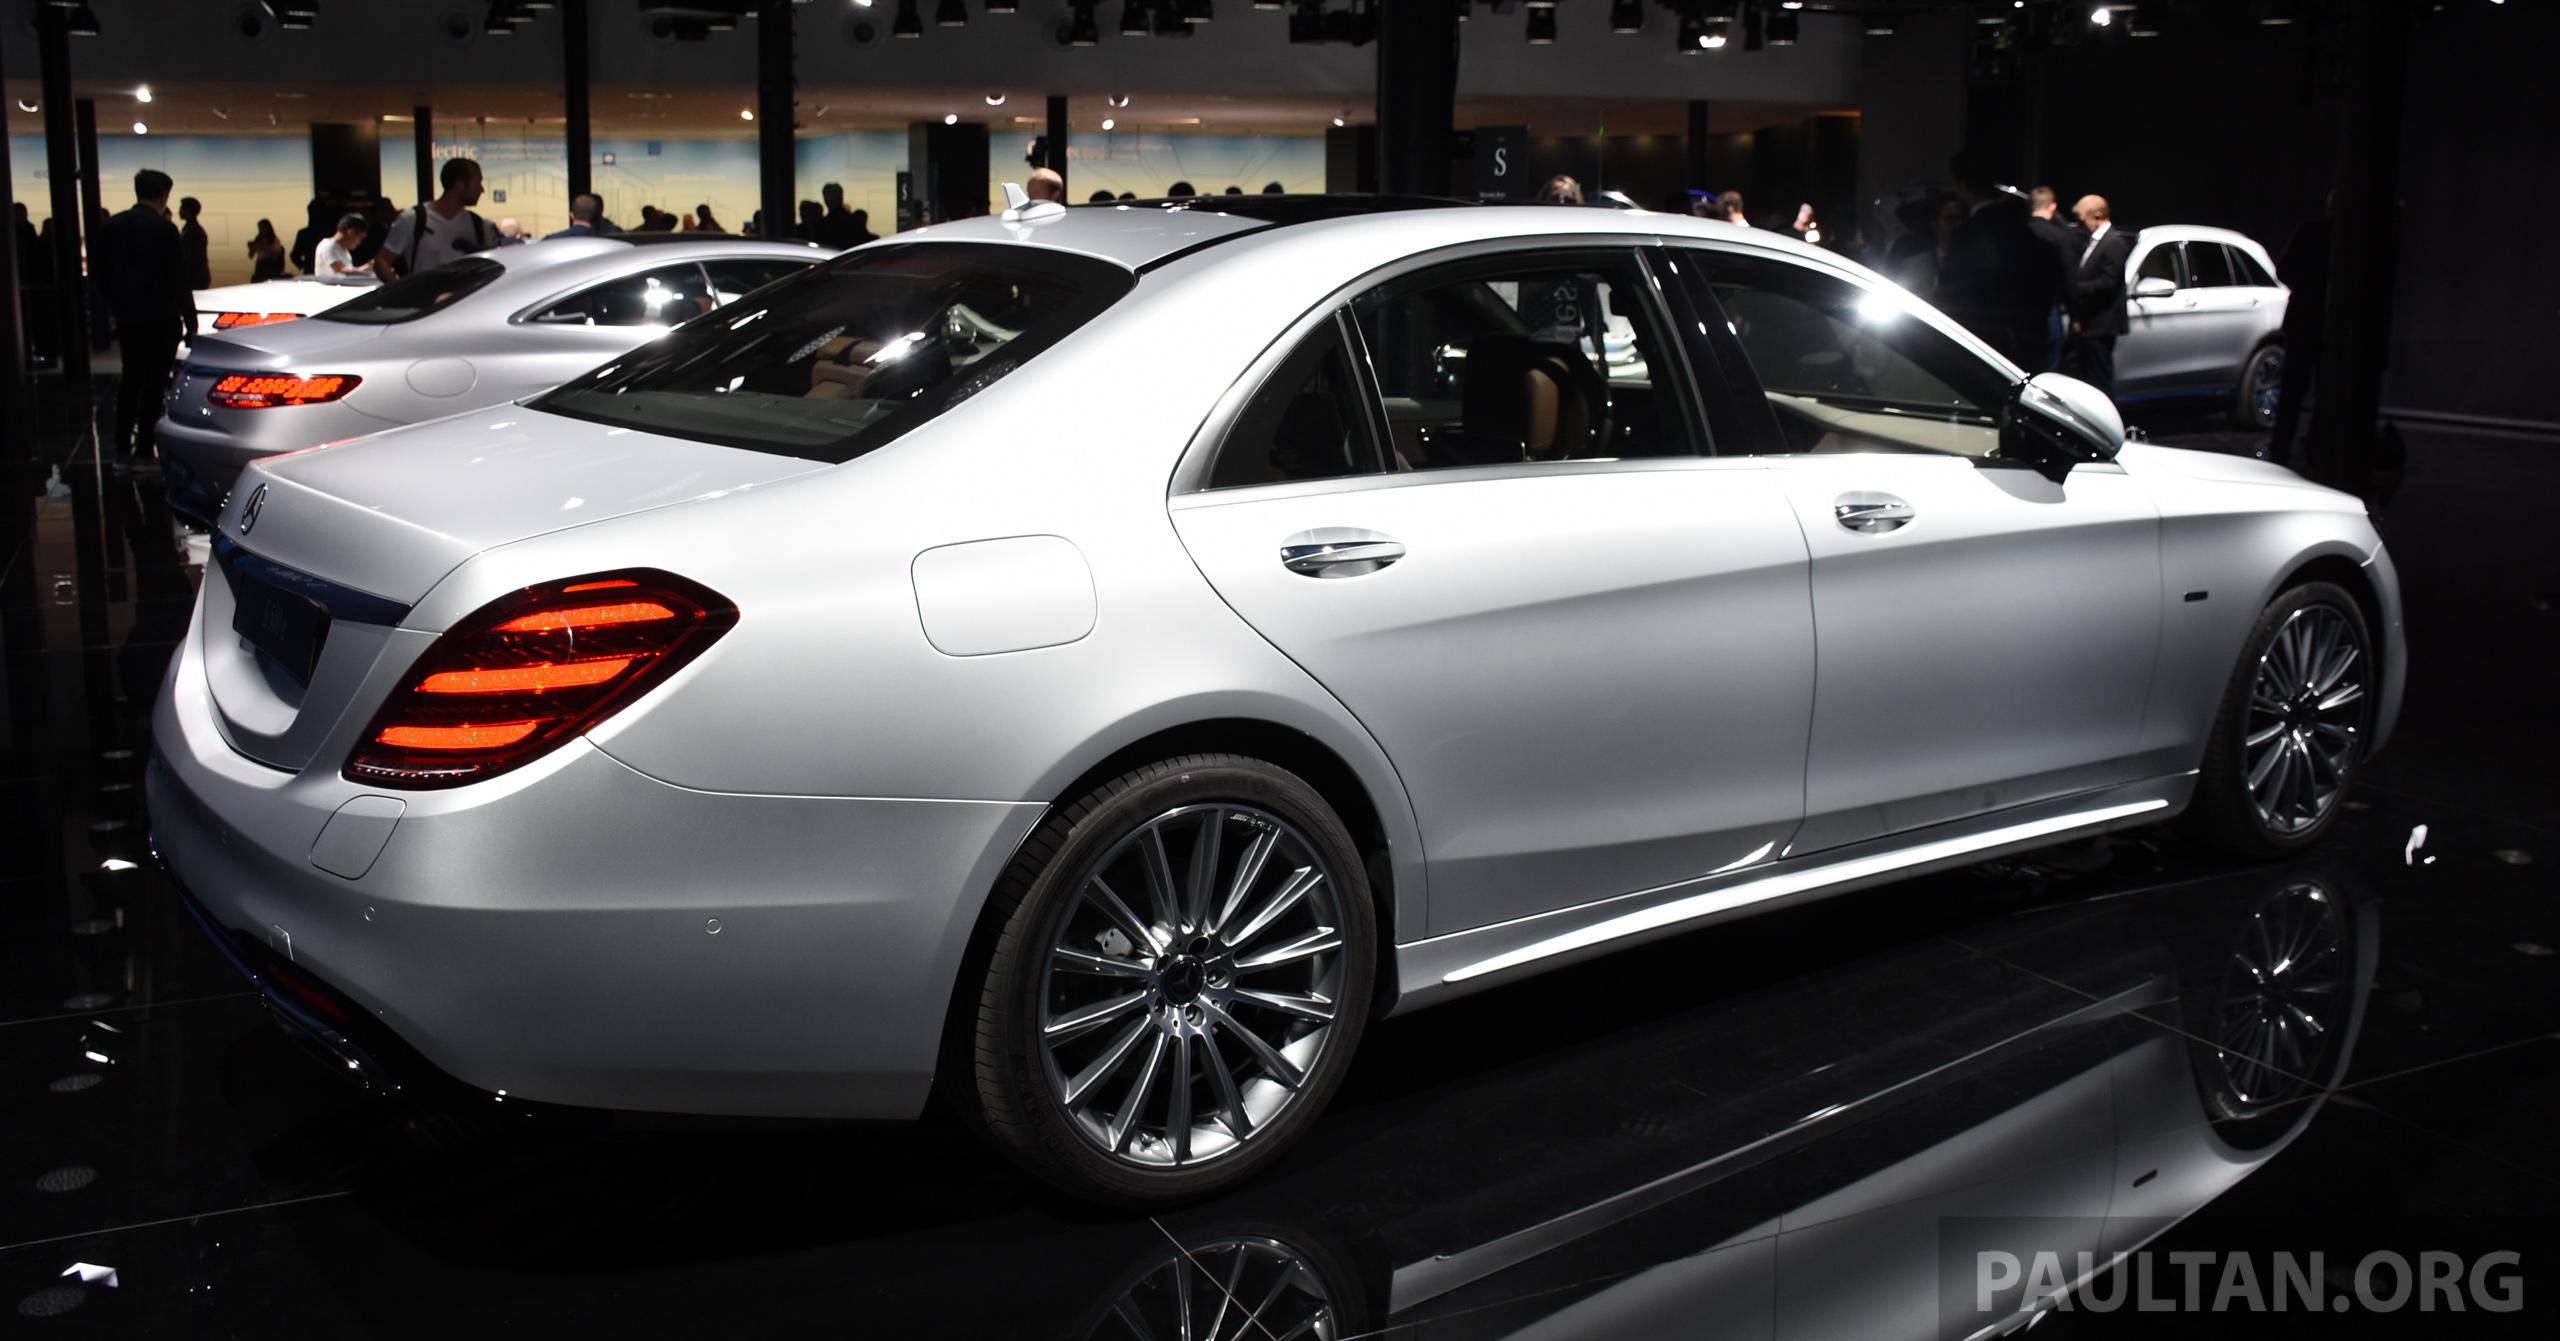 https://s3.paultan.org/image/2017/09/Mercedes-Benz-S560E-Frankfurt-2.jpg